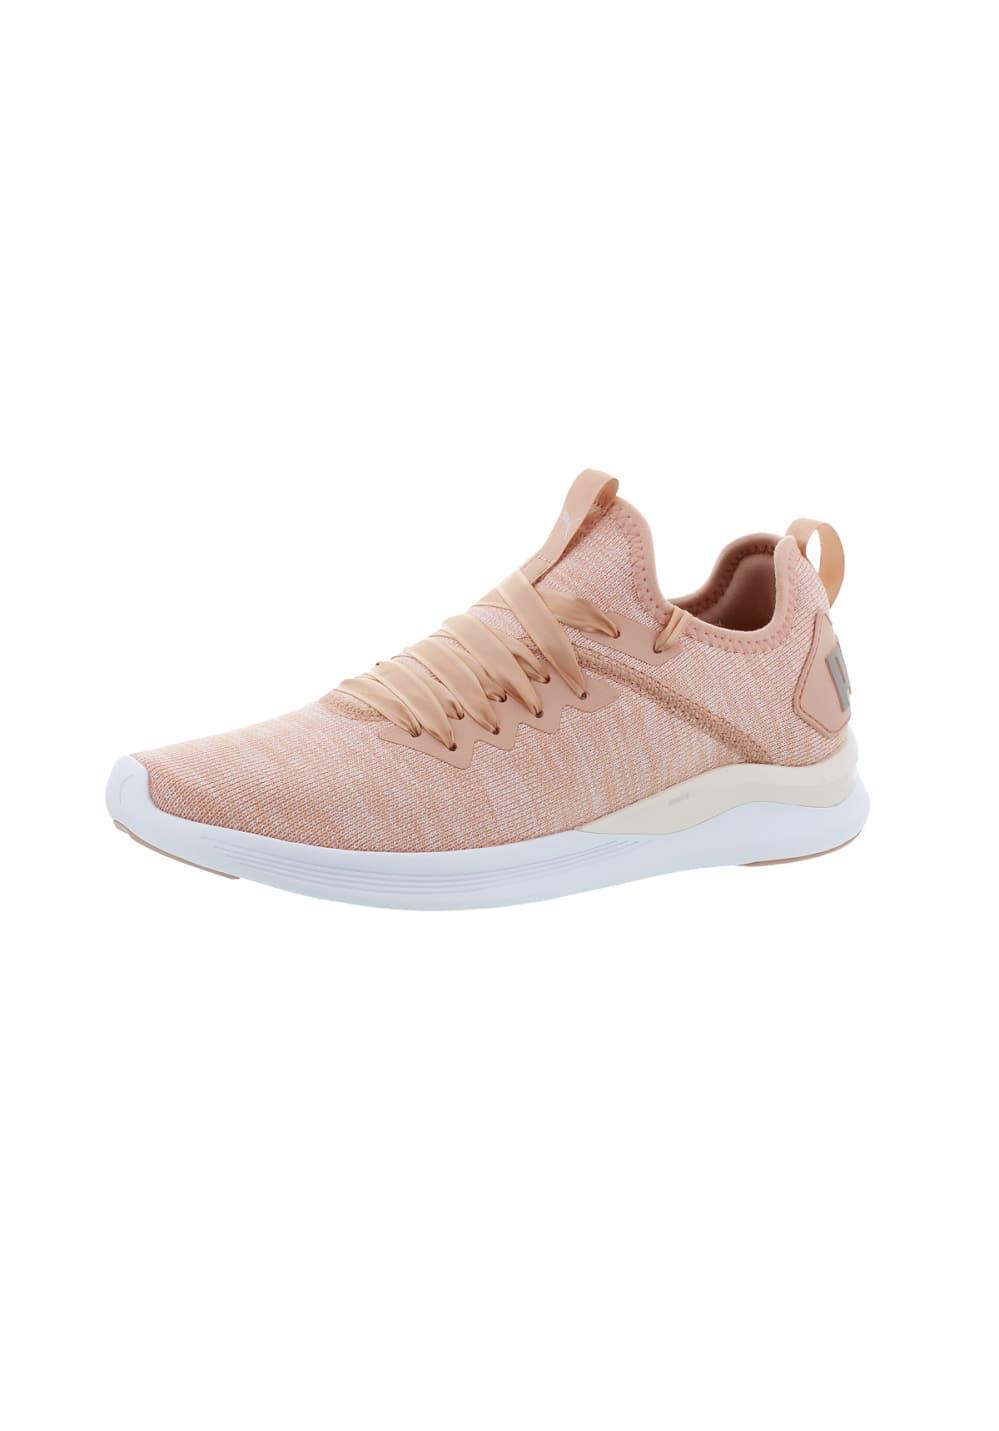 puma chaussures femmes rose